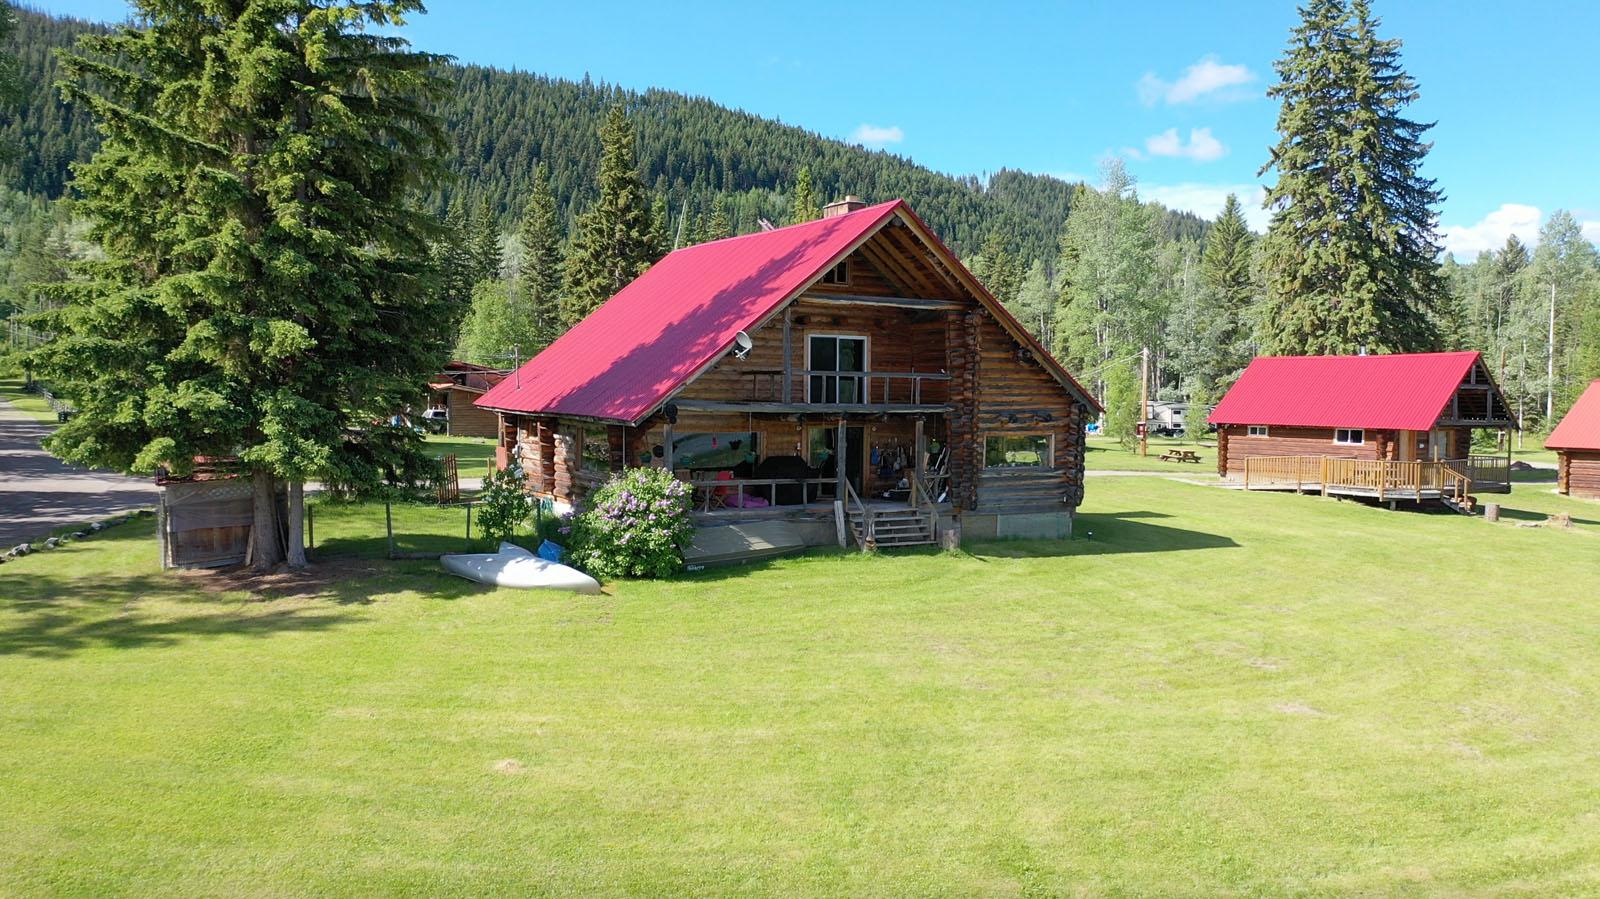 Canim lake resort 22